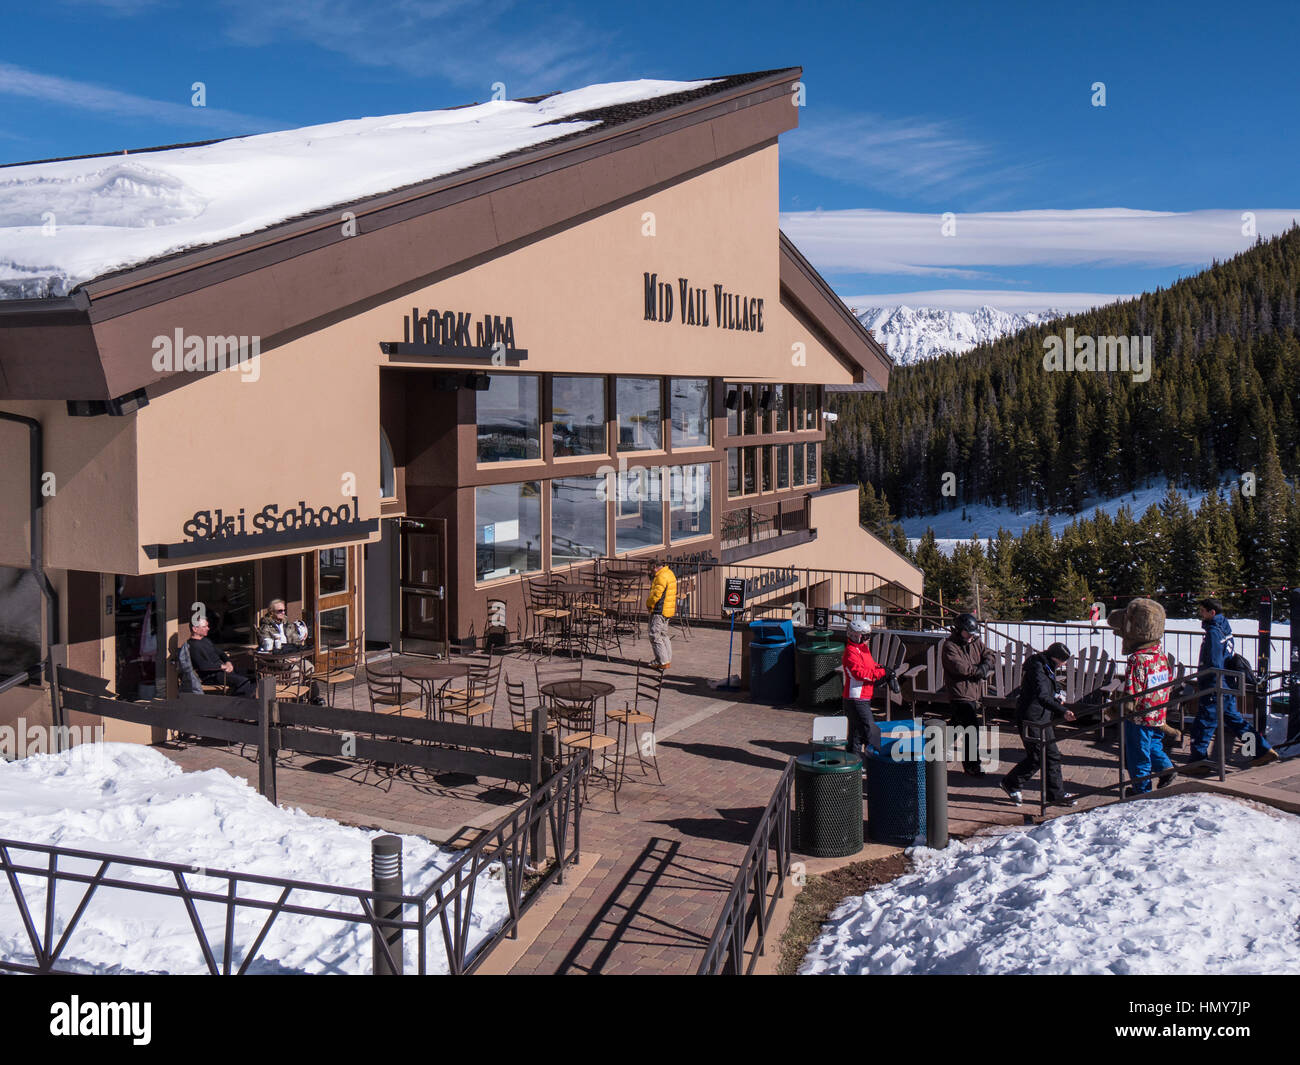 Mid-Vail Village, winter, Vail Ski Resort, Vail, Colorado. - Stock Image